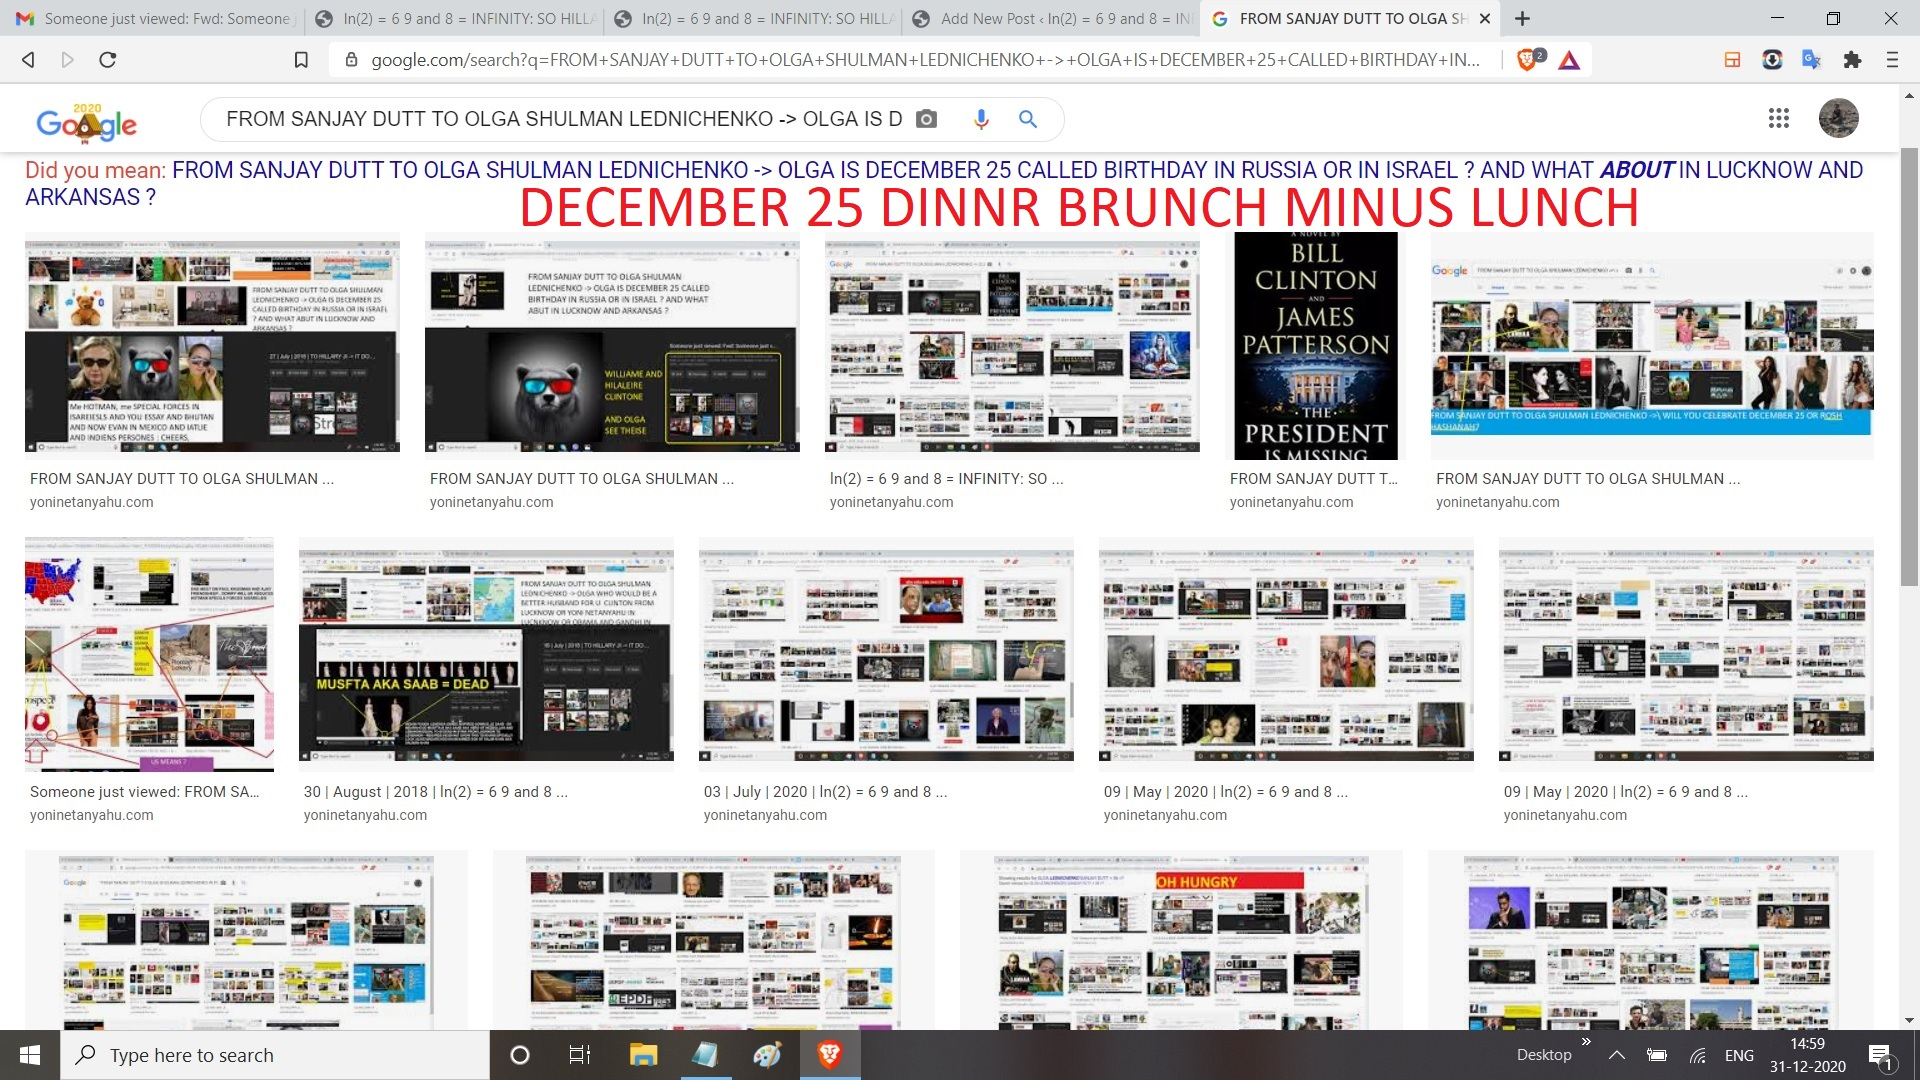 DECEMBER 25 DINNR BRUNCH MINUS LUNCH